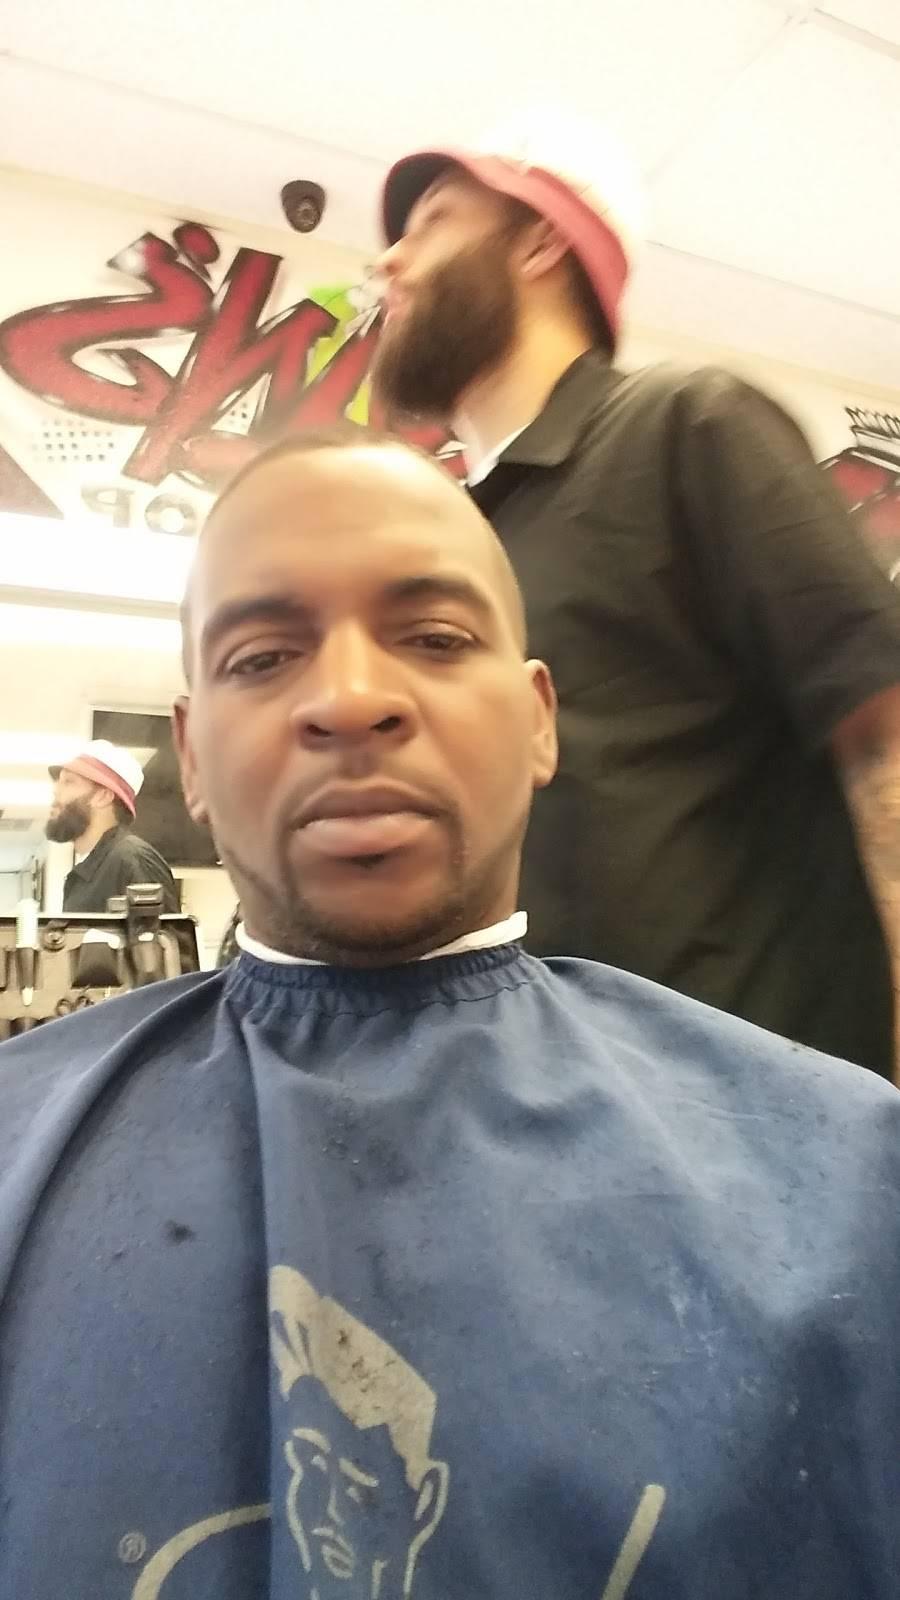 Jordans Barbershop - hair care  | Photo 1 of 5 | Address: 13697 E Iliff Ave, Aurora, CO 80014, USA | Phone: (303) 368-8682